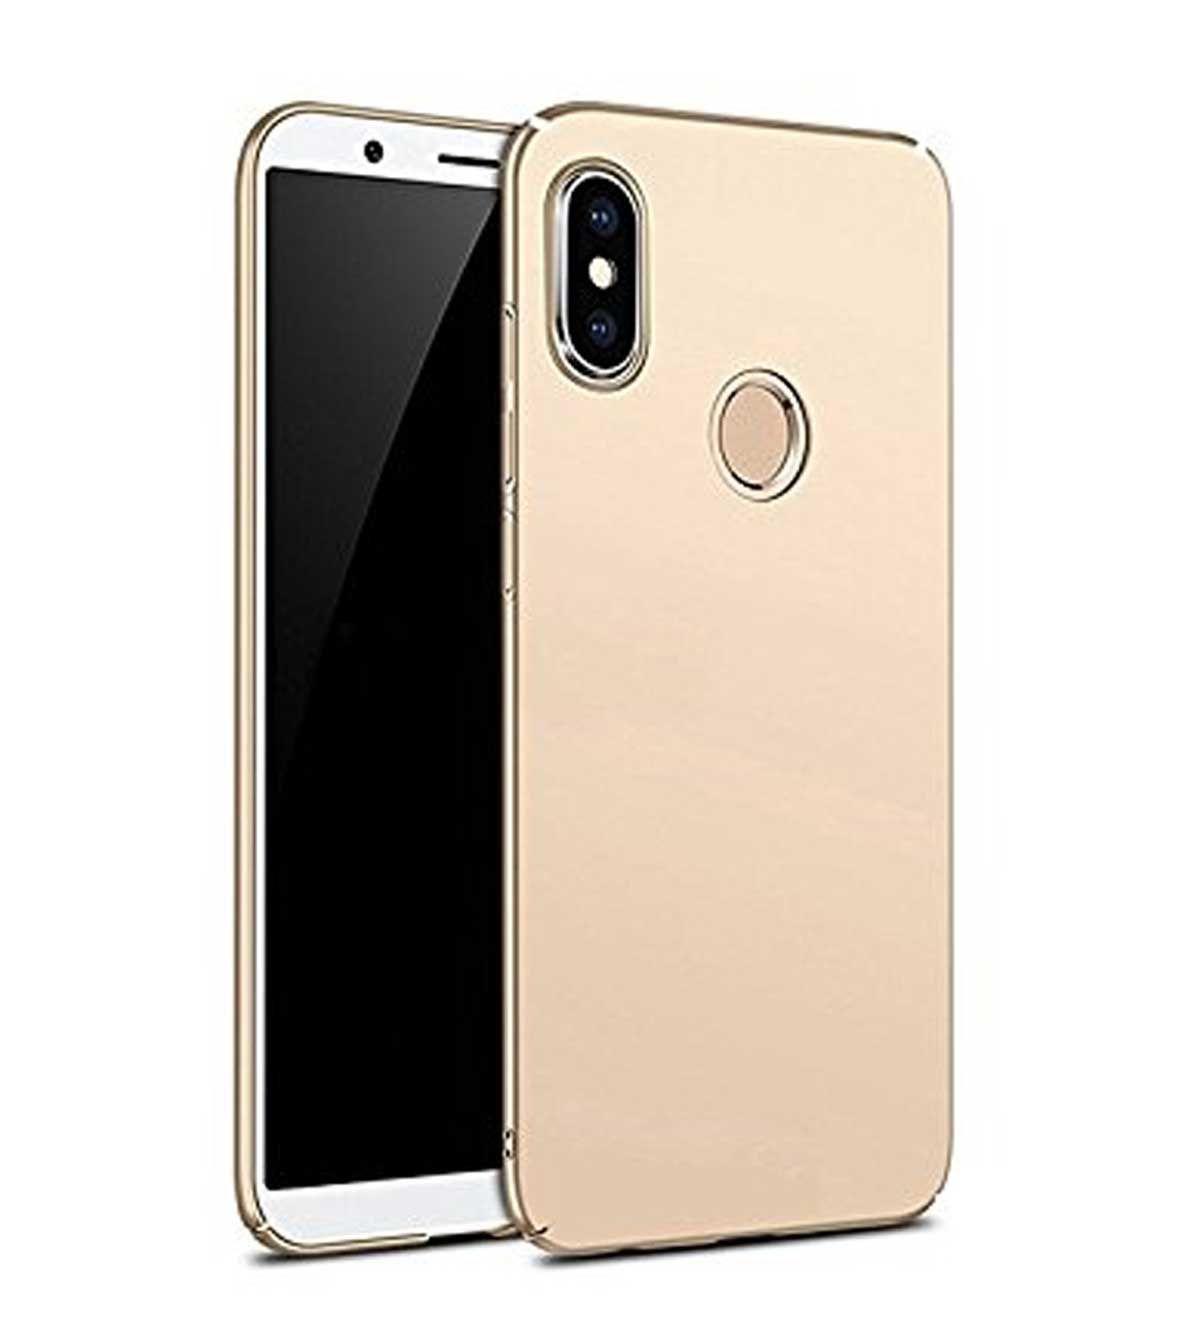 new photos 0af6a 92fe7 Xiaomi Redmi Note 5 Pro Plain Cases TBZ - Golden